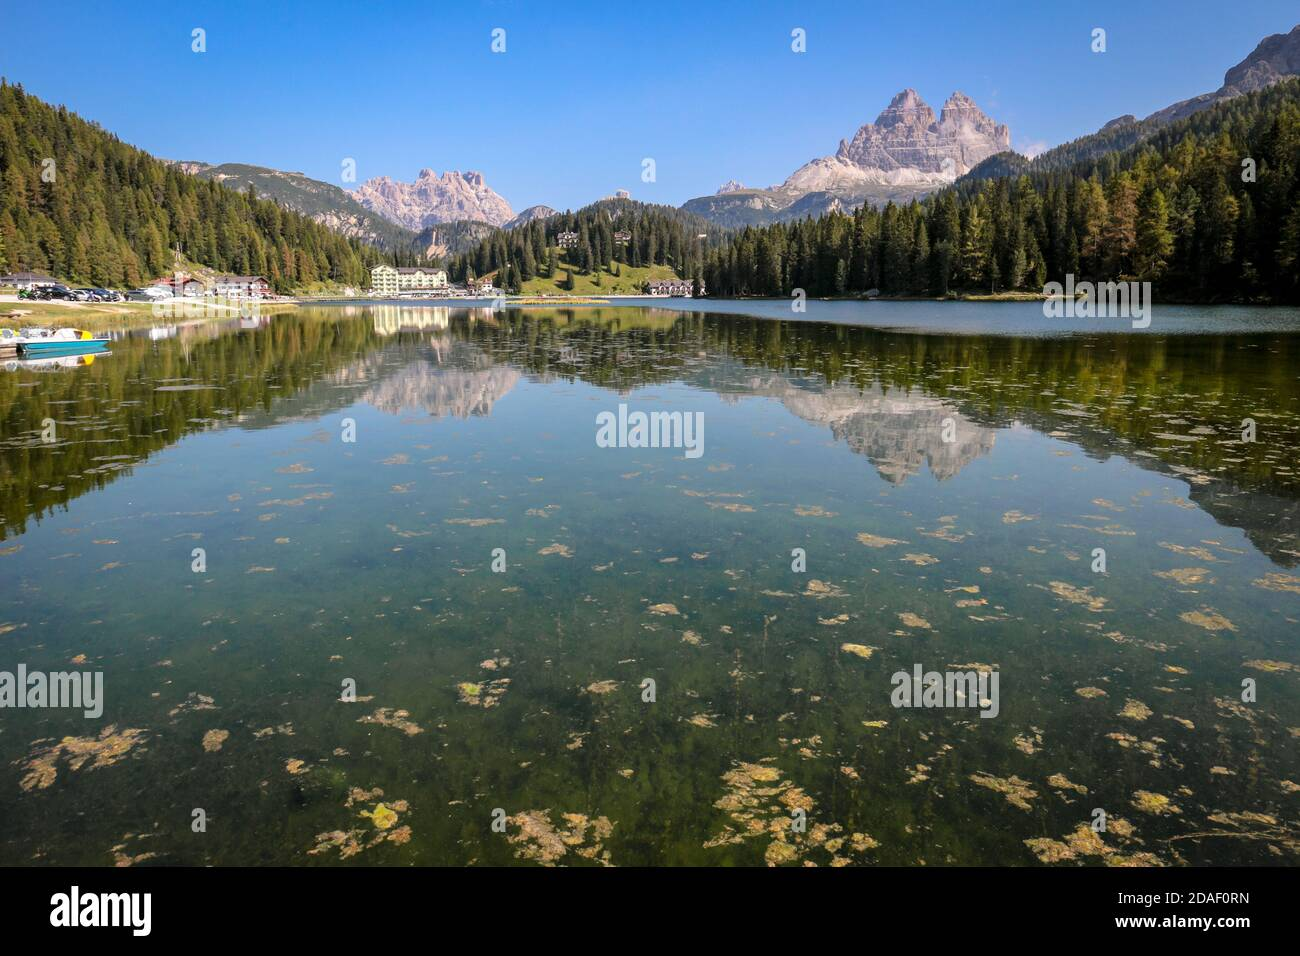 Lago di Misurina (Misurina Lake) with mirror lake reflections of the alpine mountain panorama of the Dolomites in Misurina, Veneto, northern Italy. Stock Photo